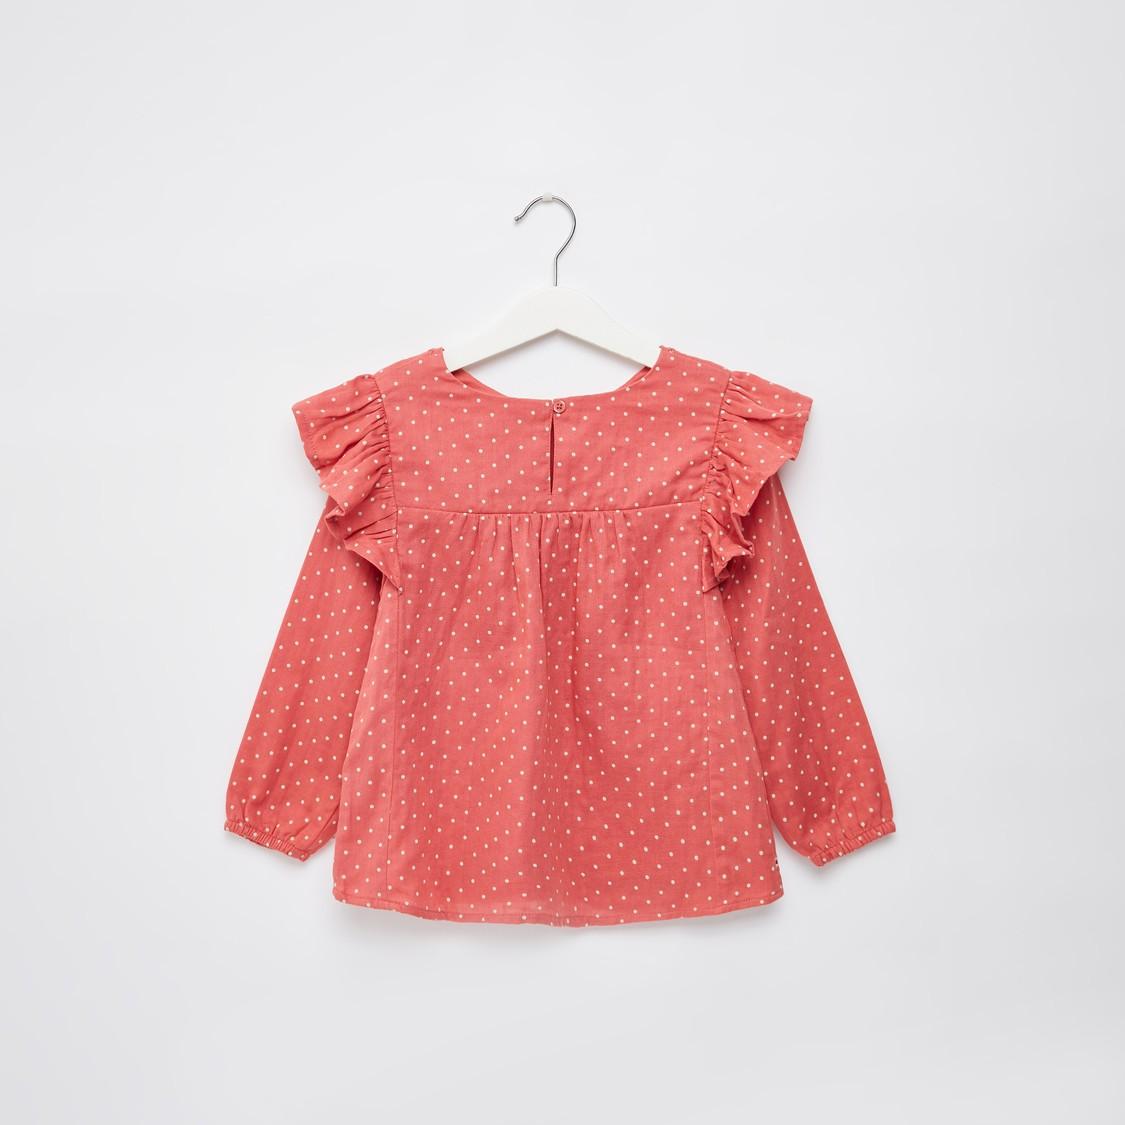 Polka Dot Print Tunic Top with Embroidered Yoke and Long Sleeves